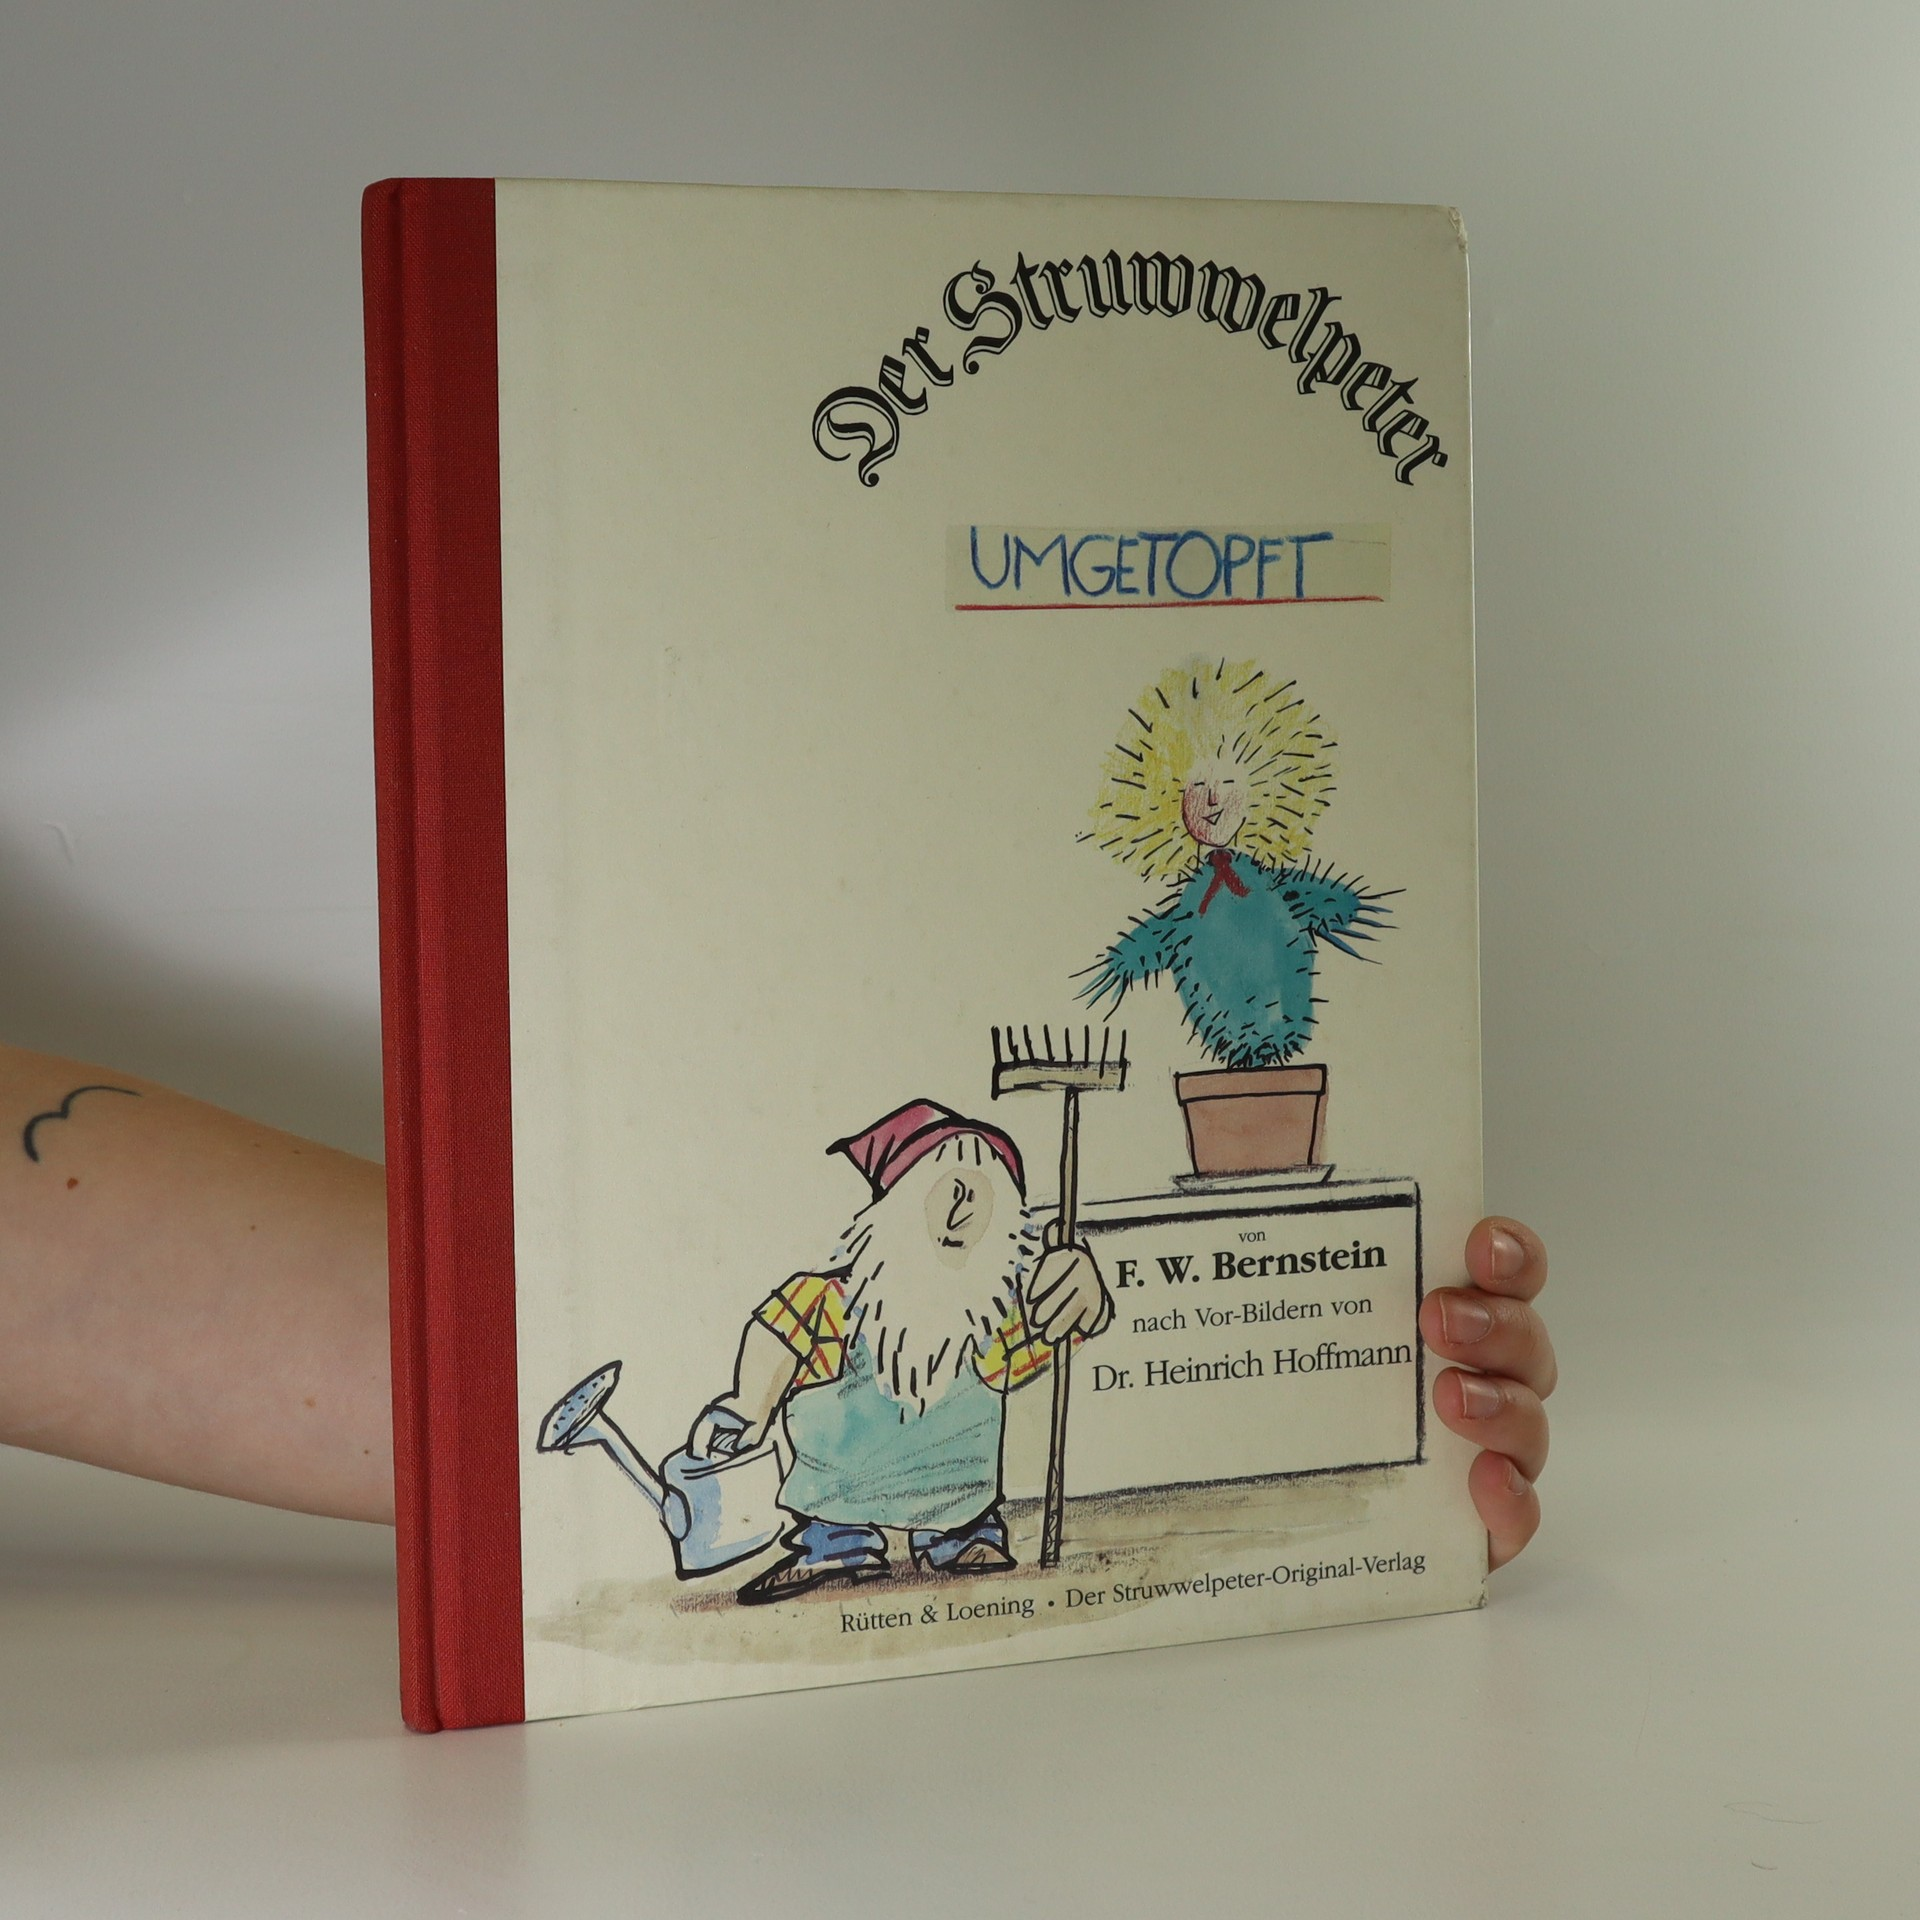 antikvární kniha Der Struwwelpeter umgetopft, 1994